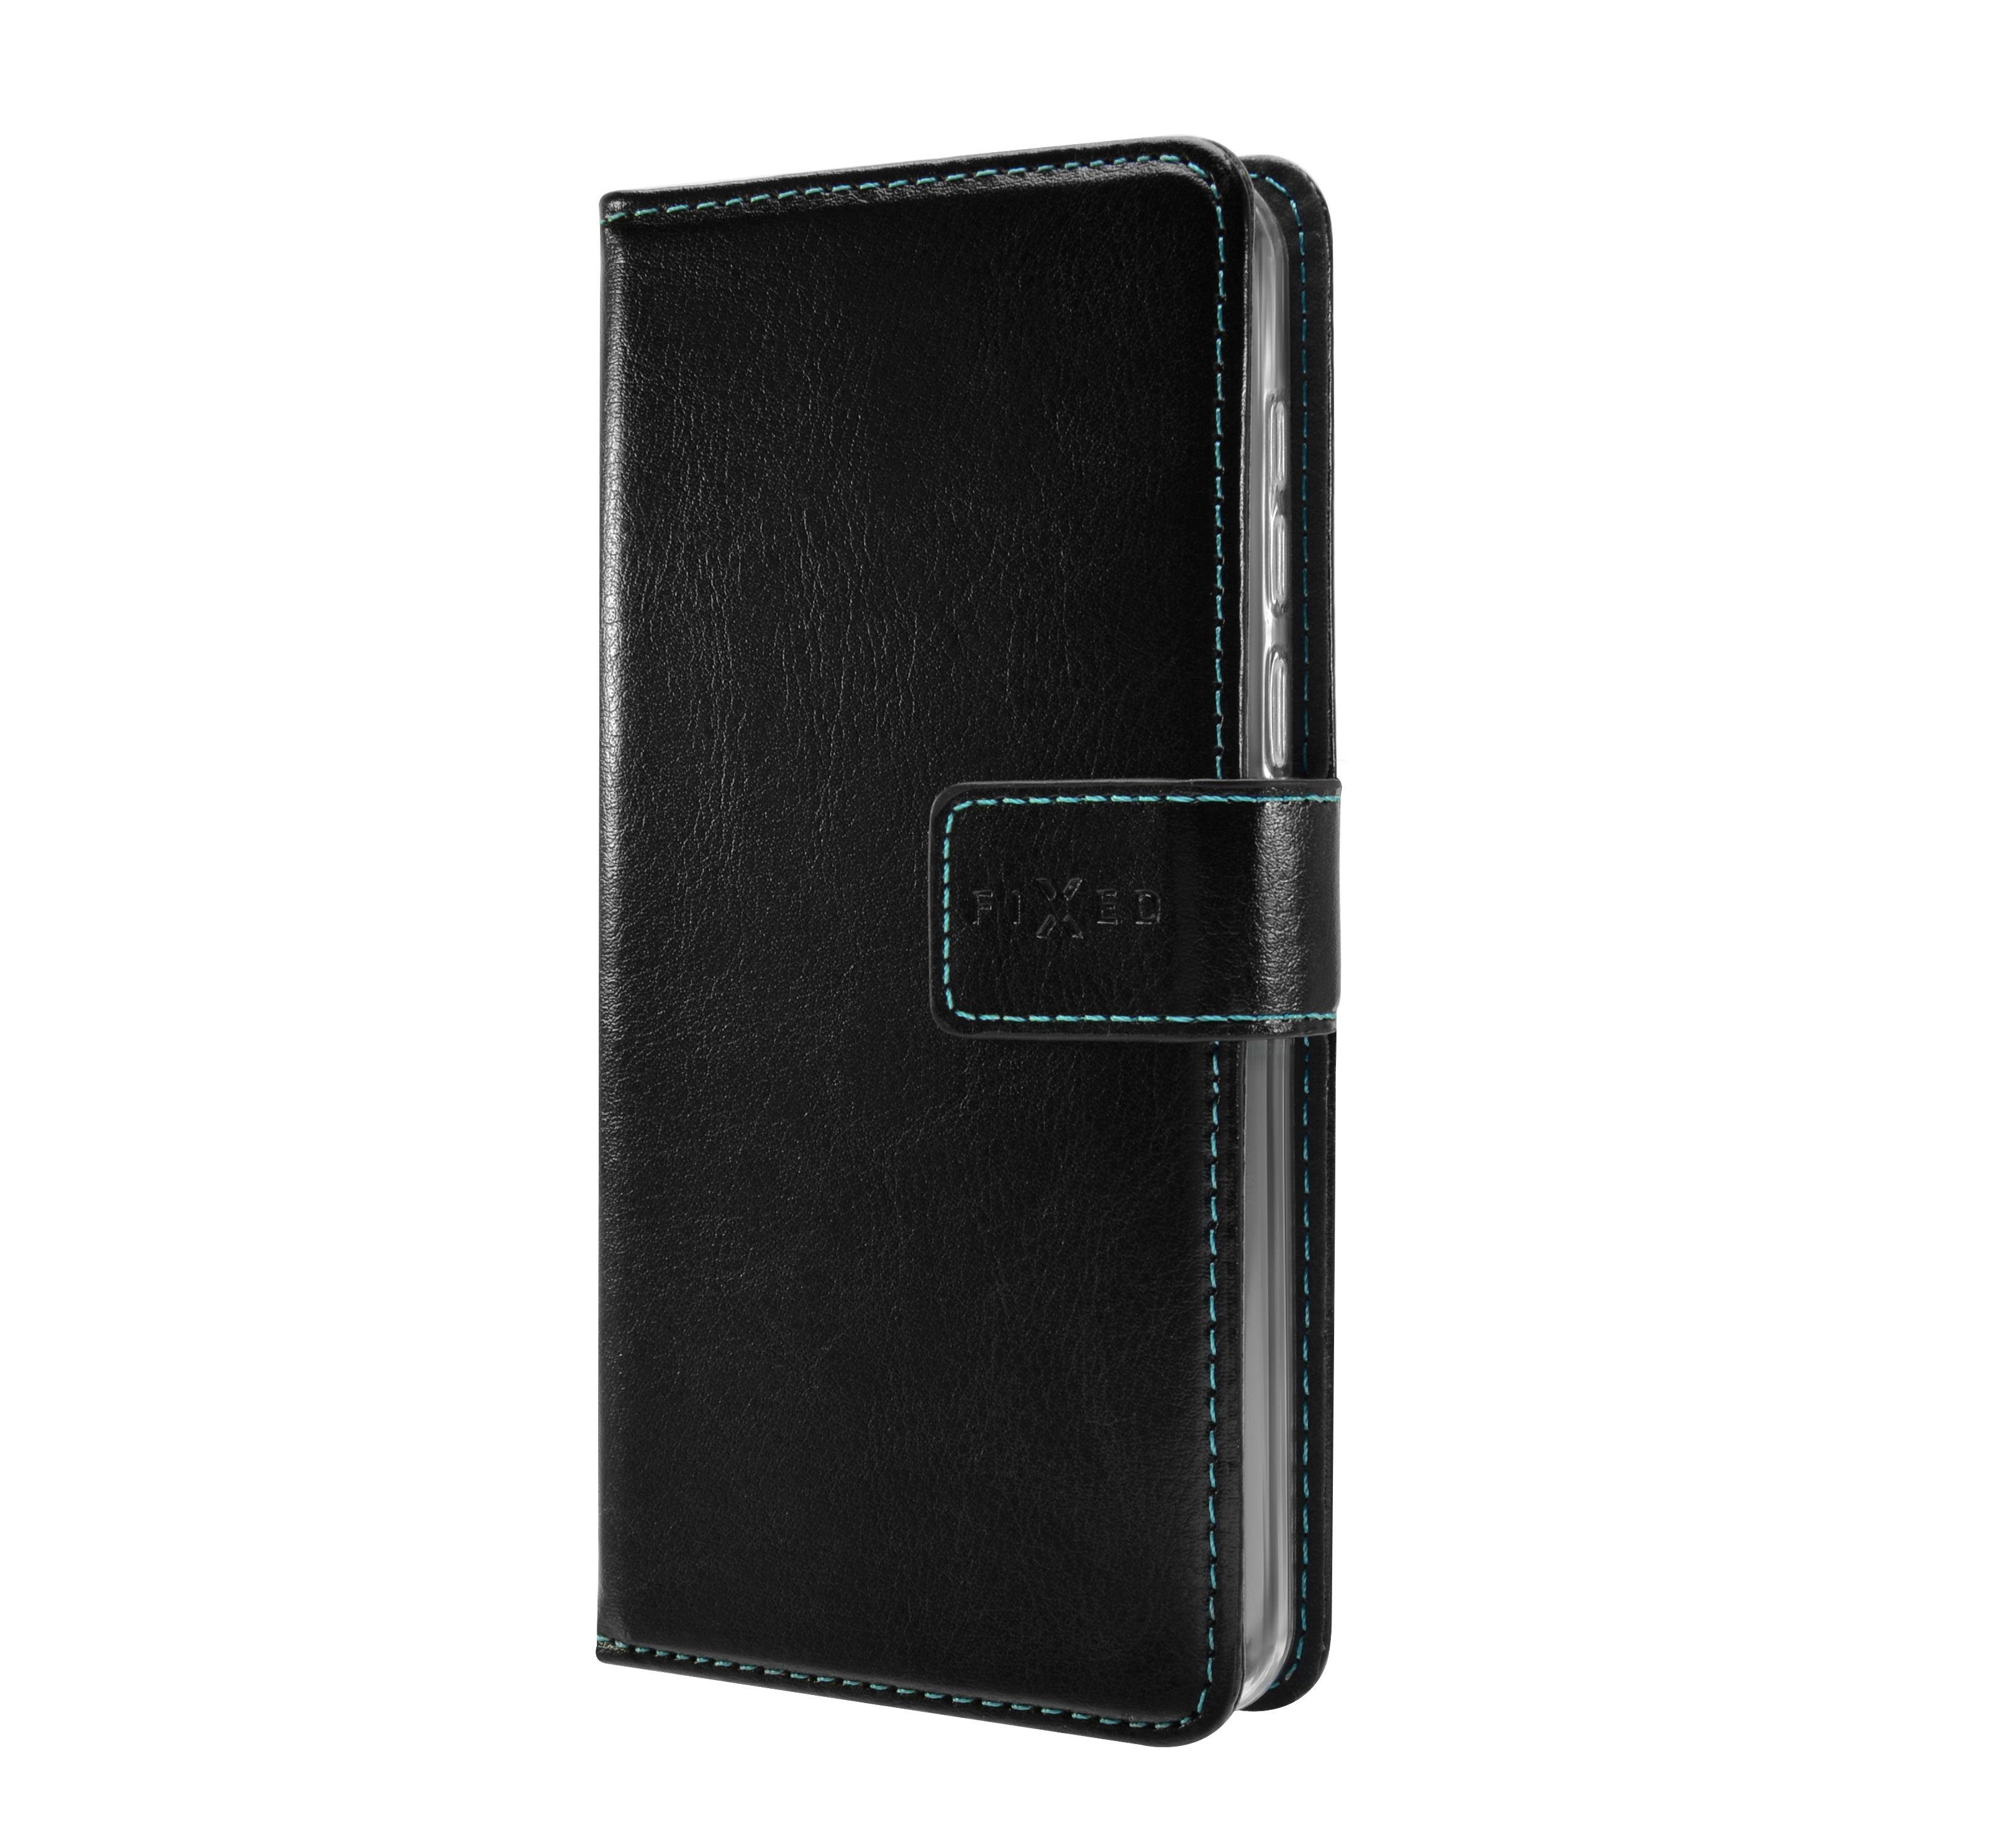 Pouzdro typu kniha FIXED Opus pro Huawei P40 Lite, černé